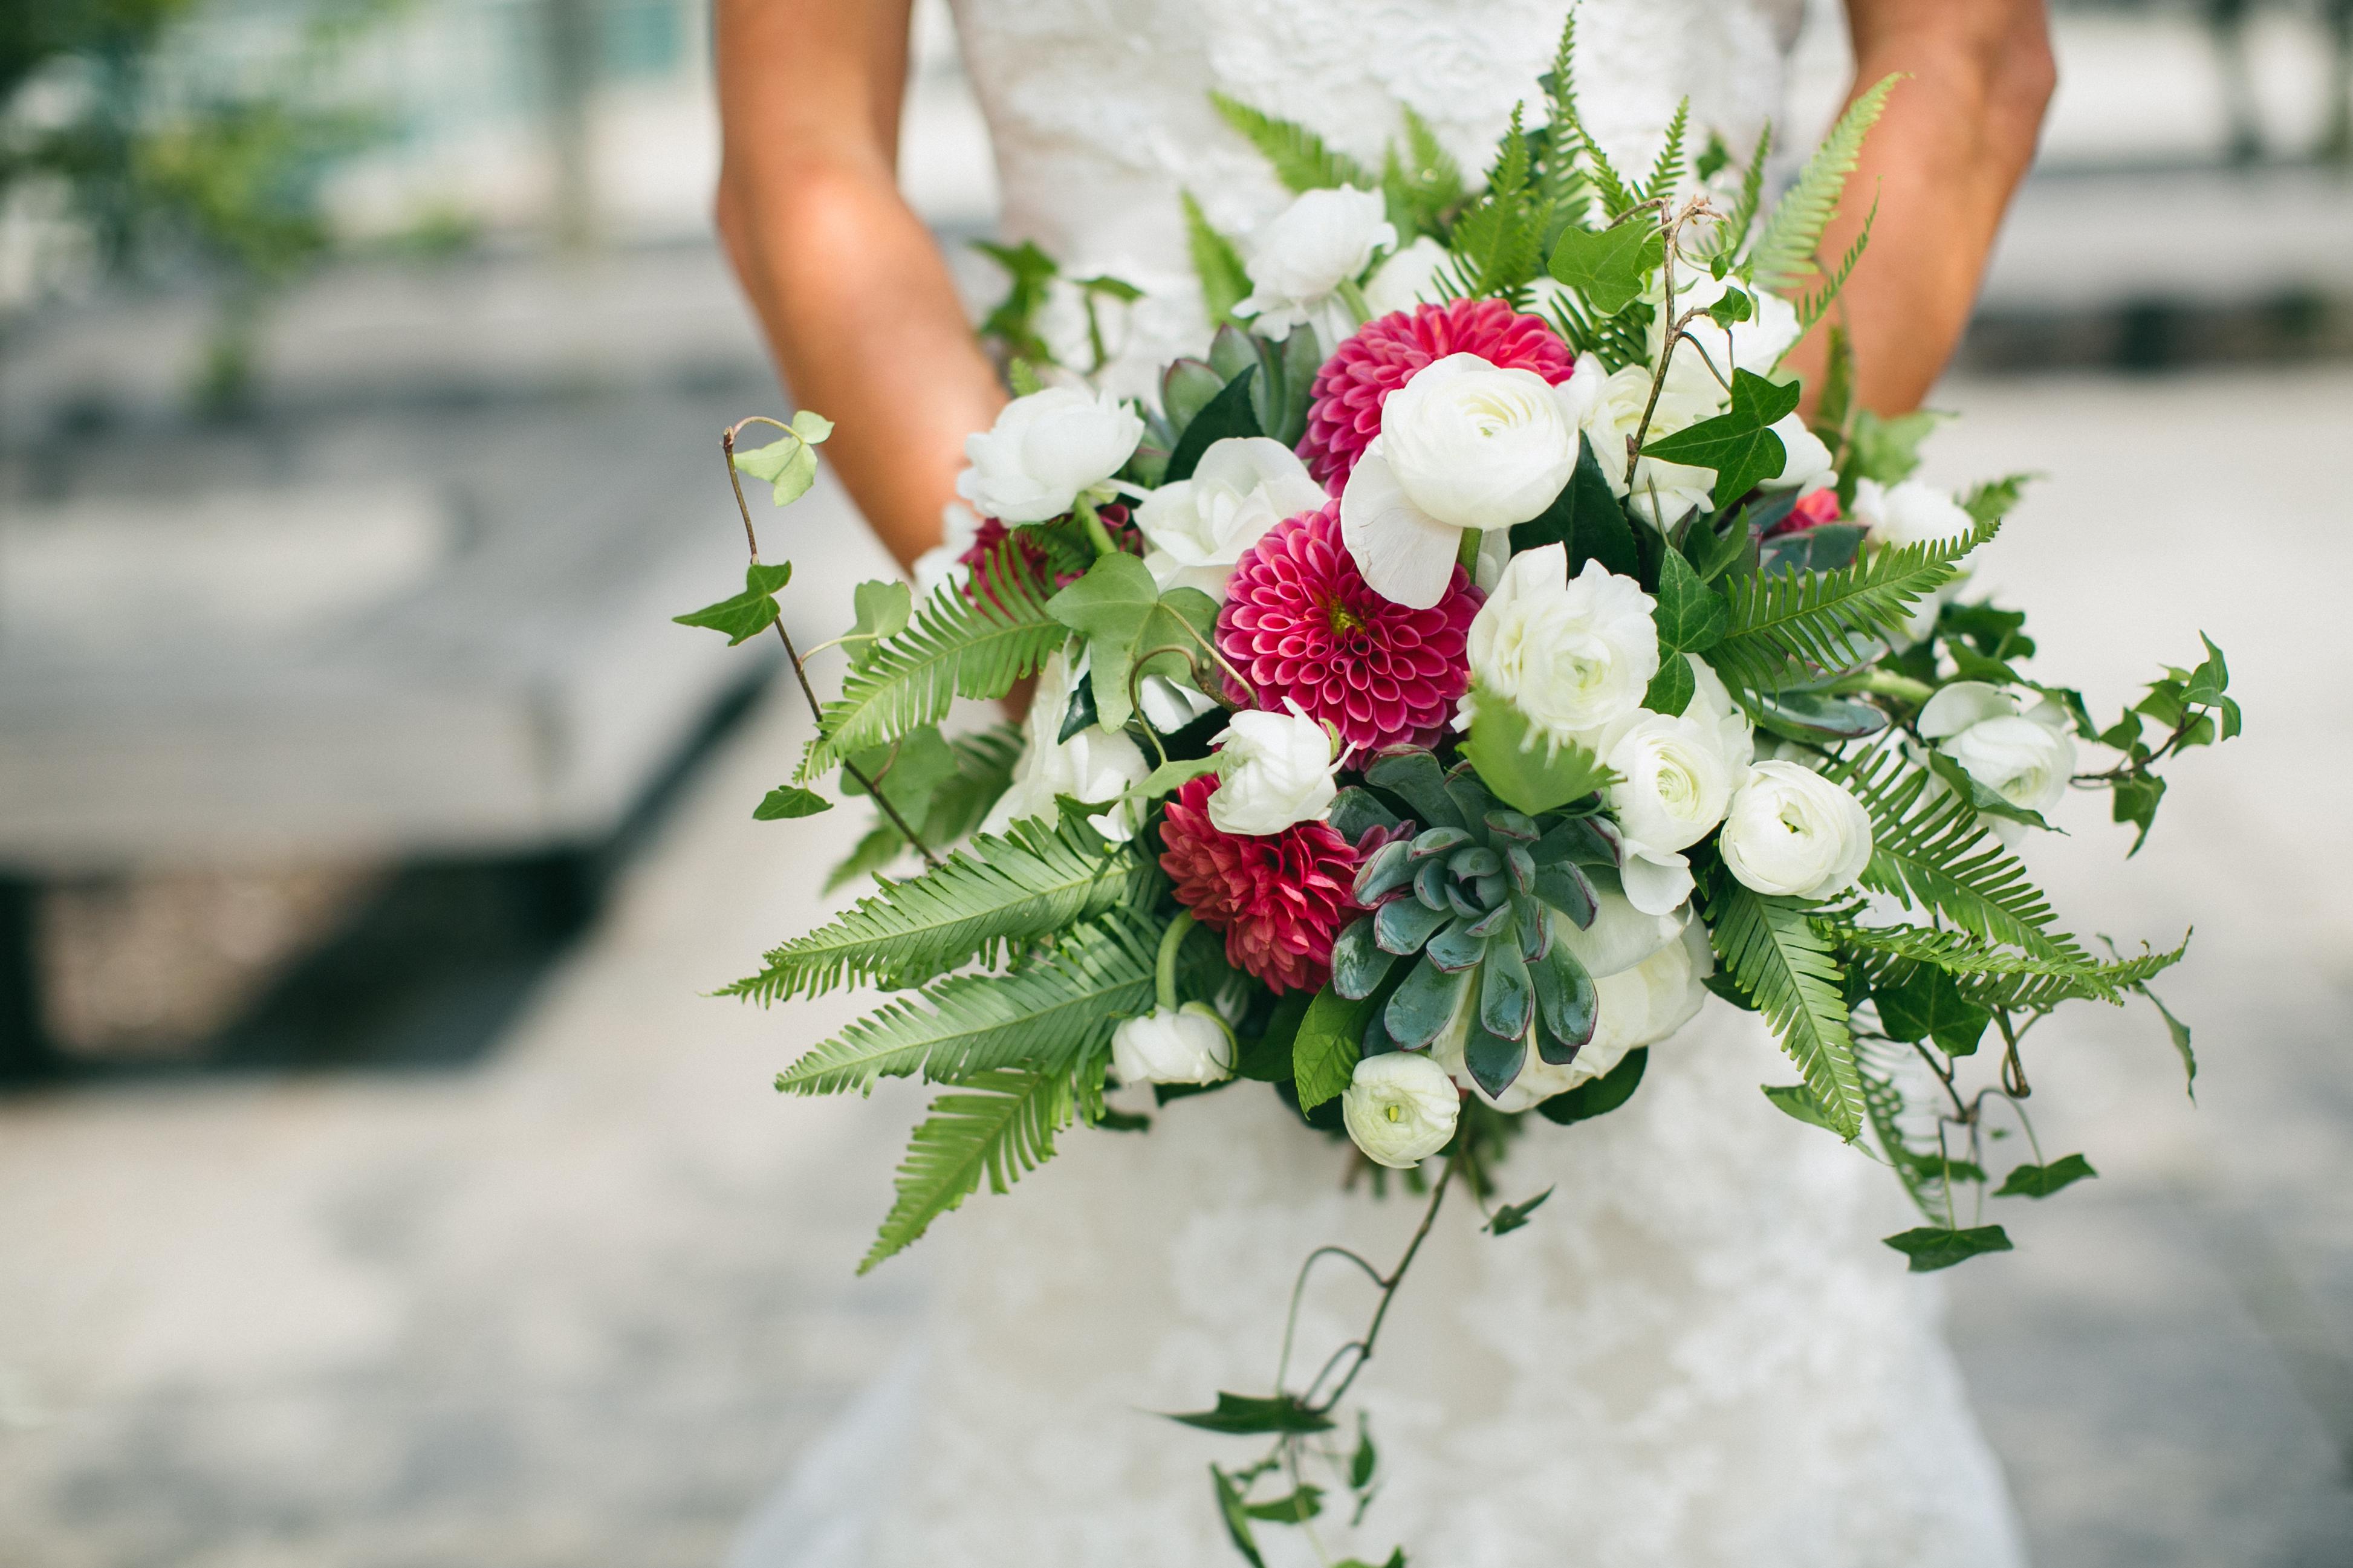 Posted by Flor del Monte, Inc. - A Design/Decor/Floral professional